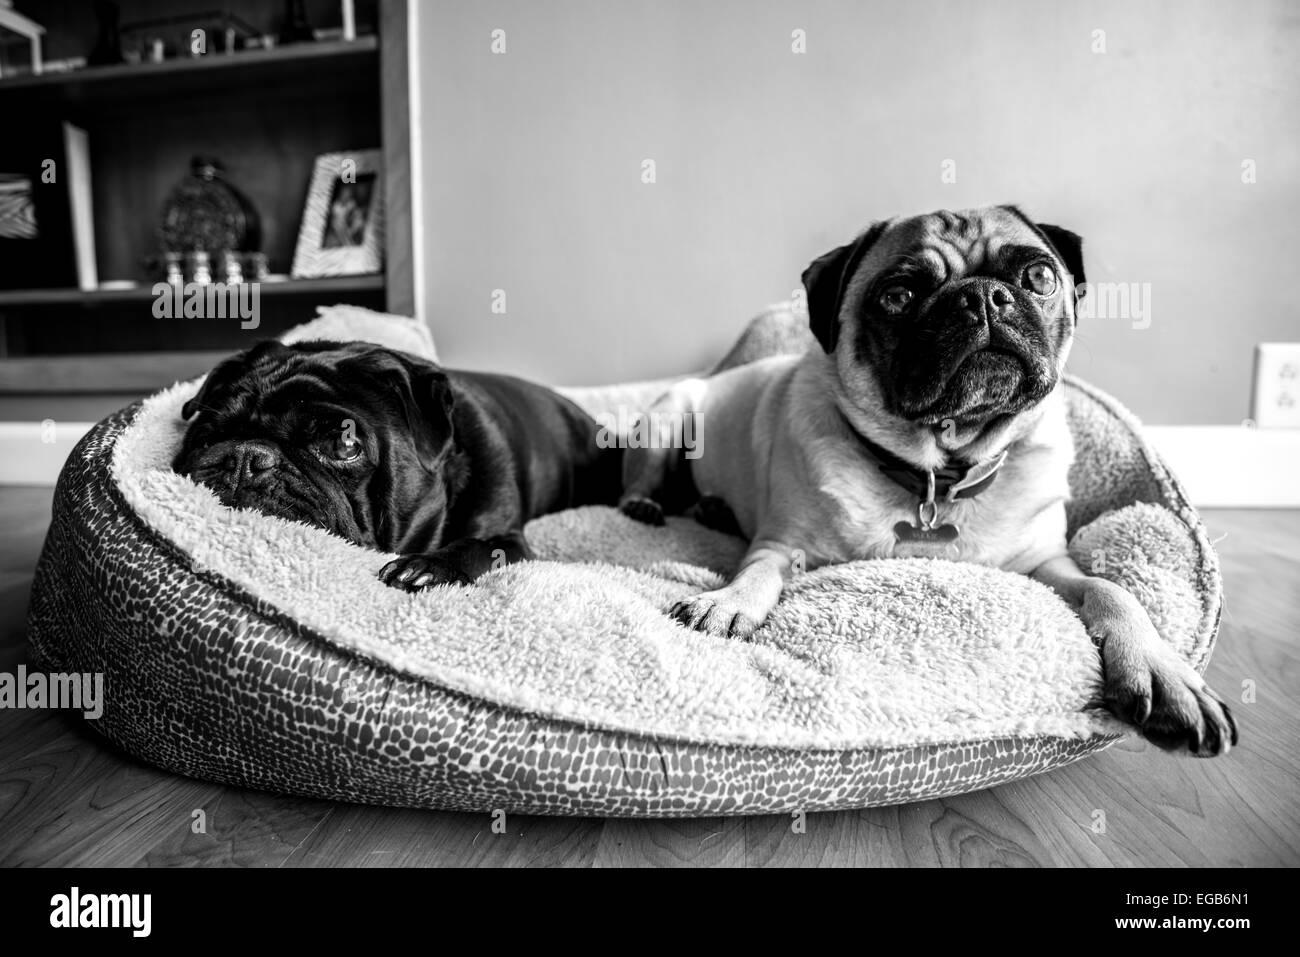 Cozy Pugs - Stock Image